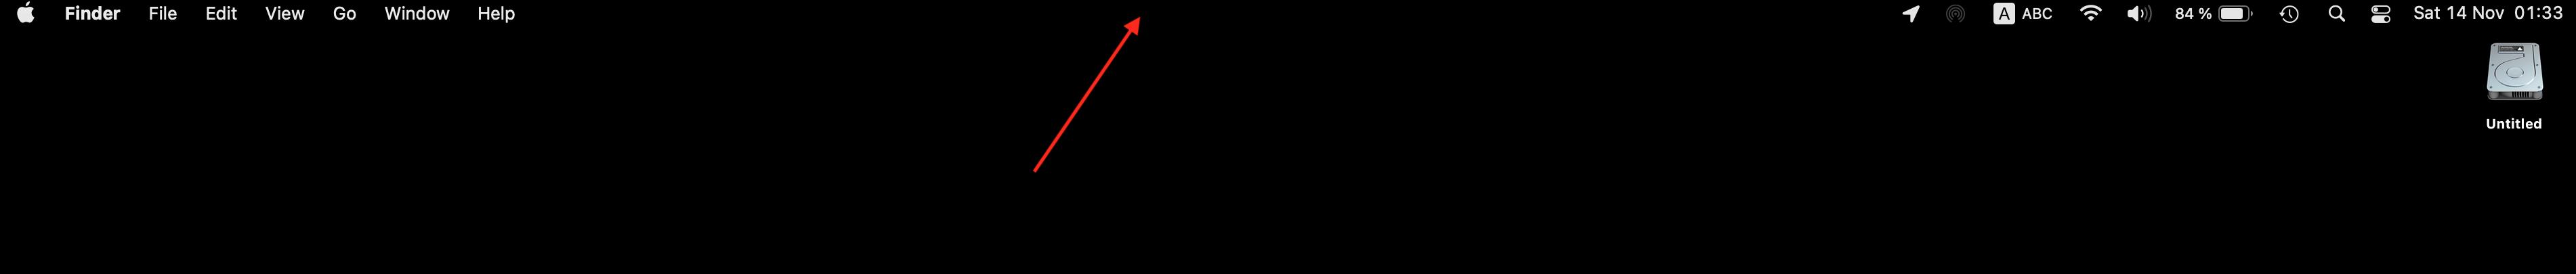 191257